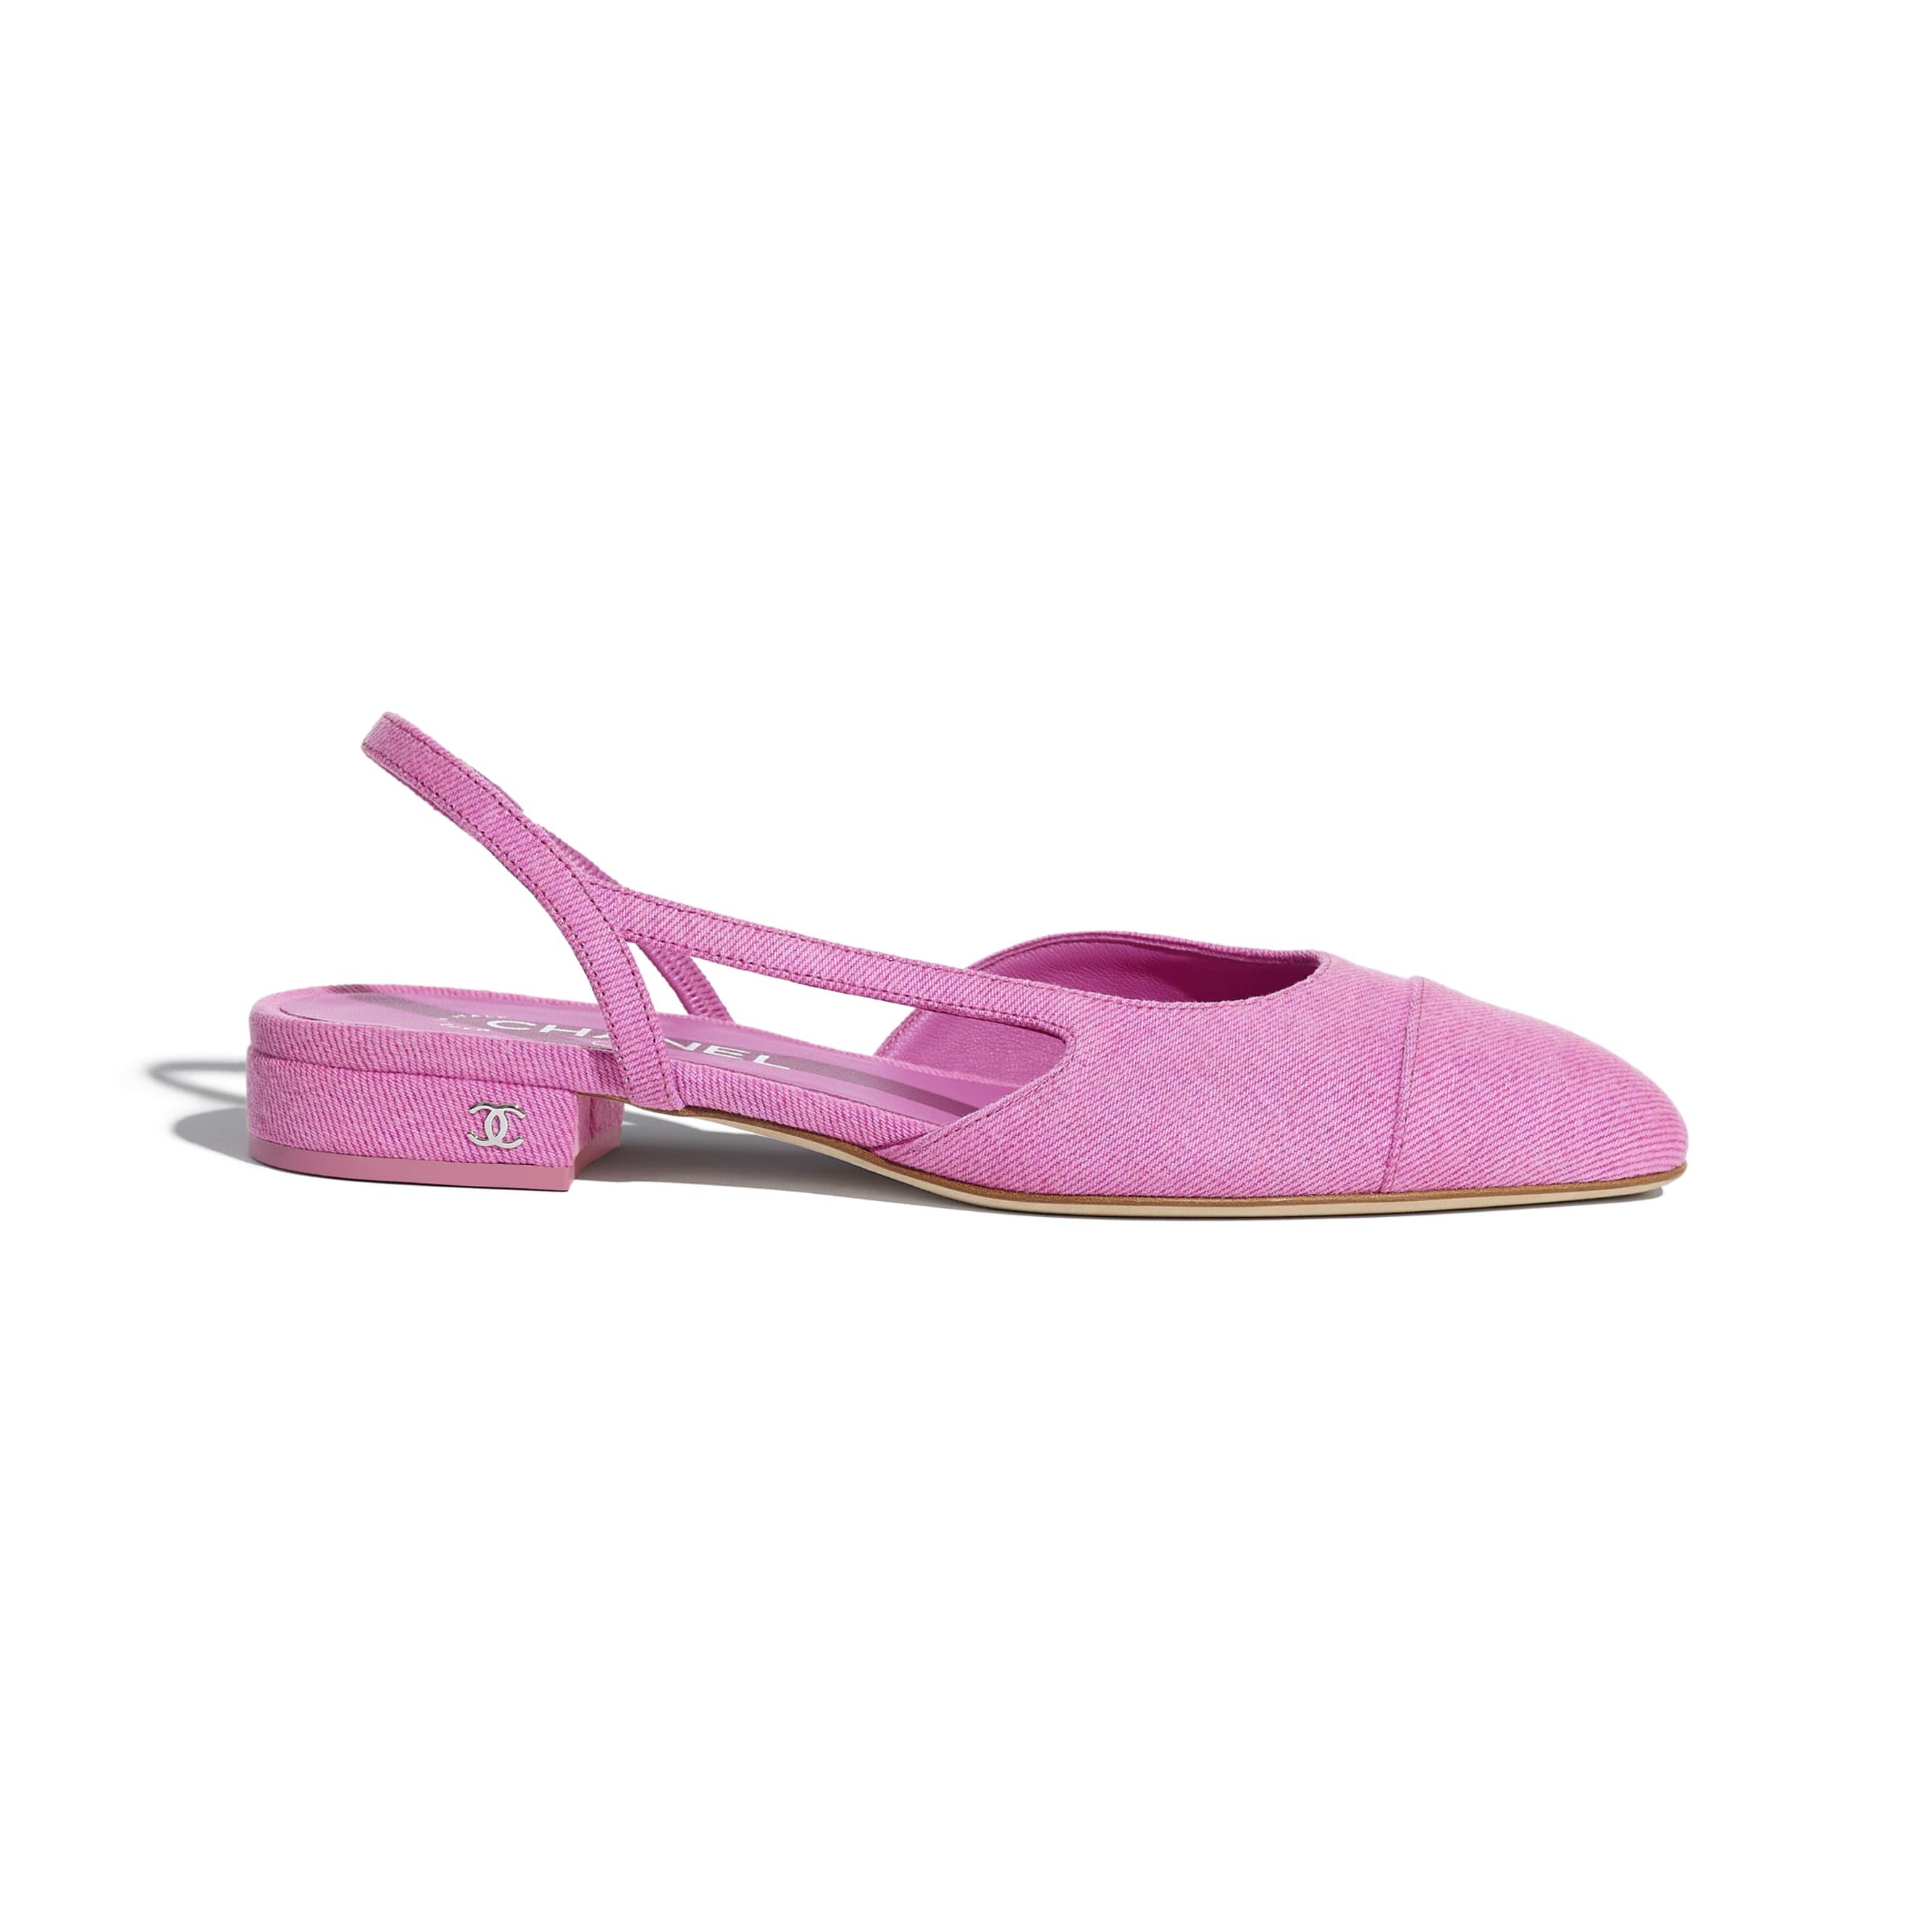 Sling-Back - Neon Pink - Denim - CHANEL - Default view - see standard sized version